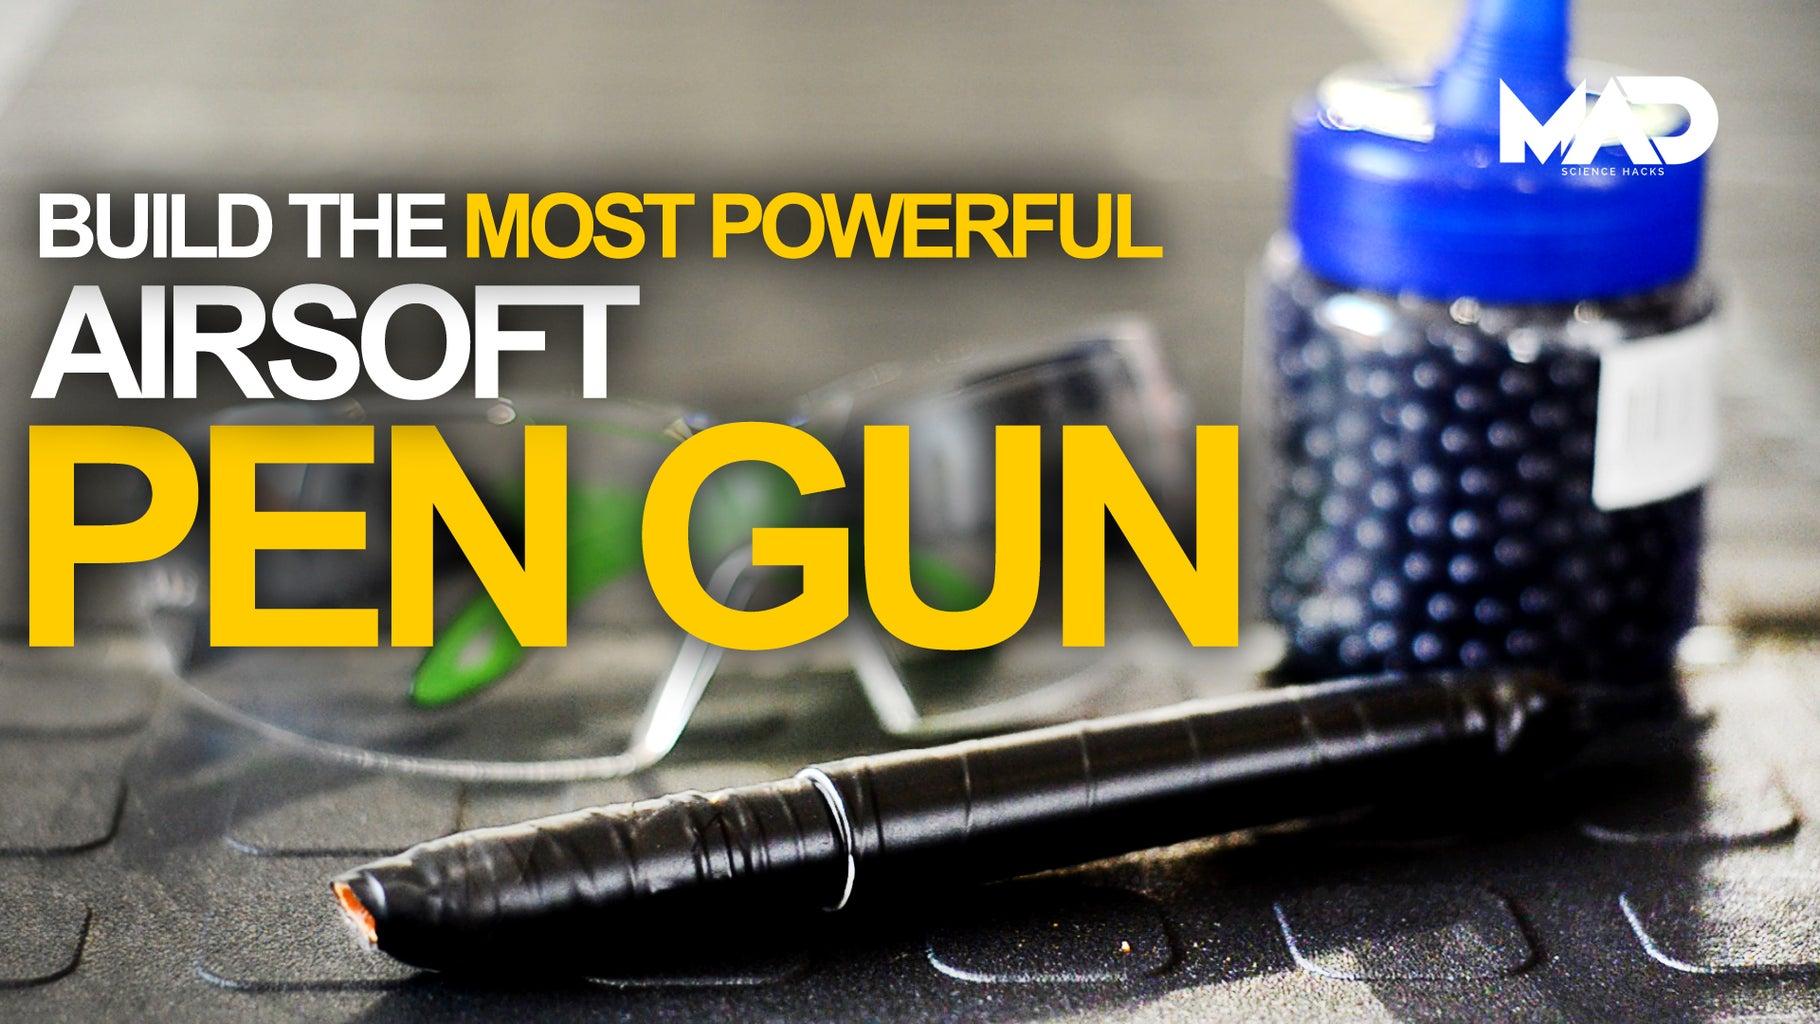 Extreme Airsoft Pen Gun